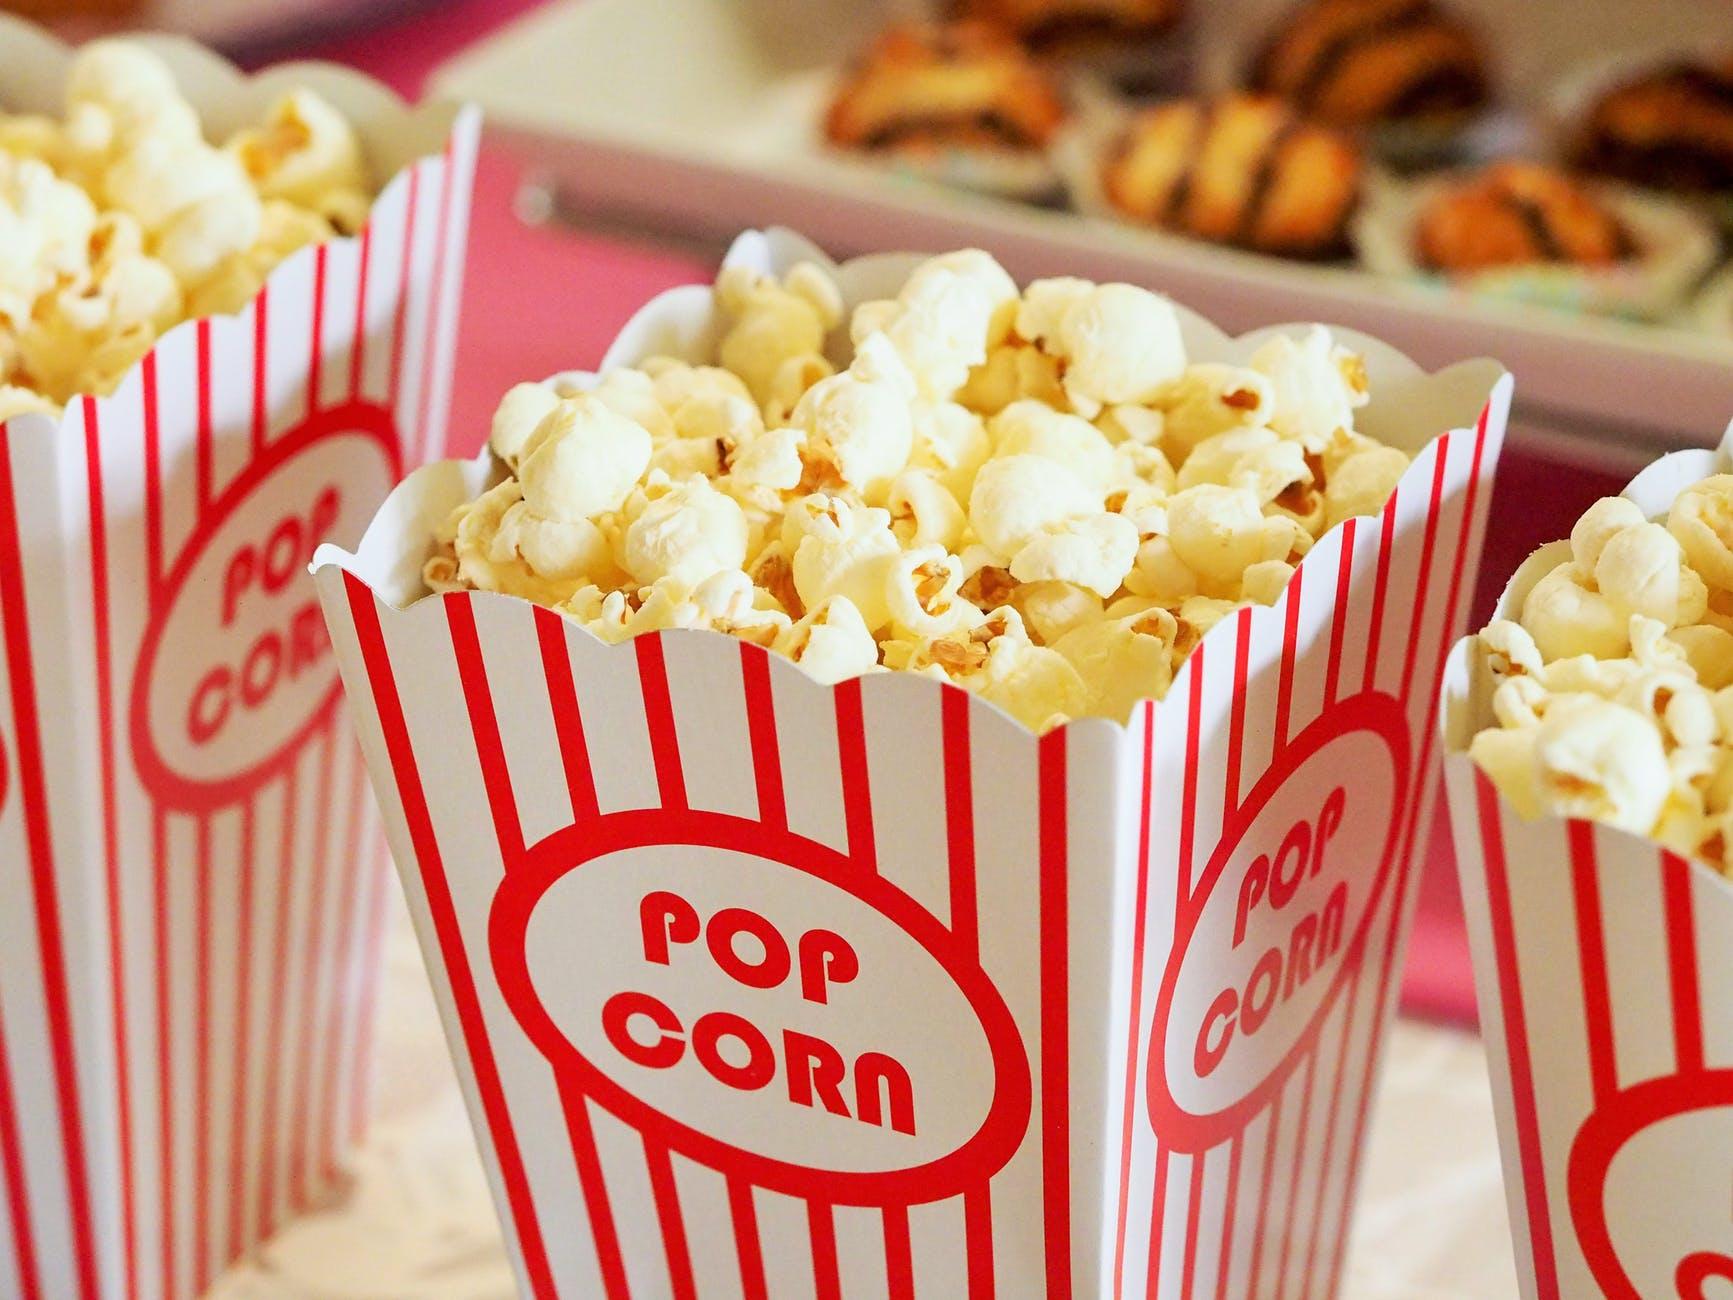 Finals week inspiration:    Set up a pinterest & popcorn event   on your campus.